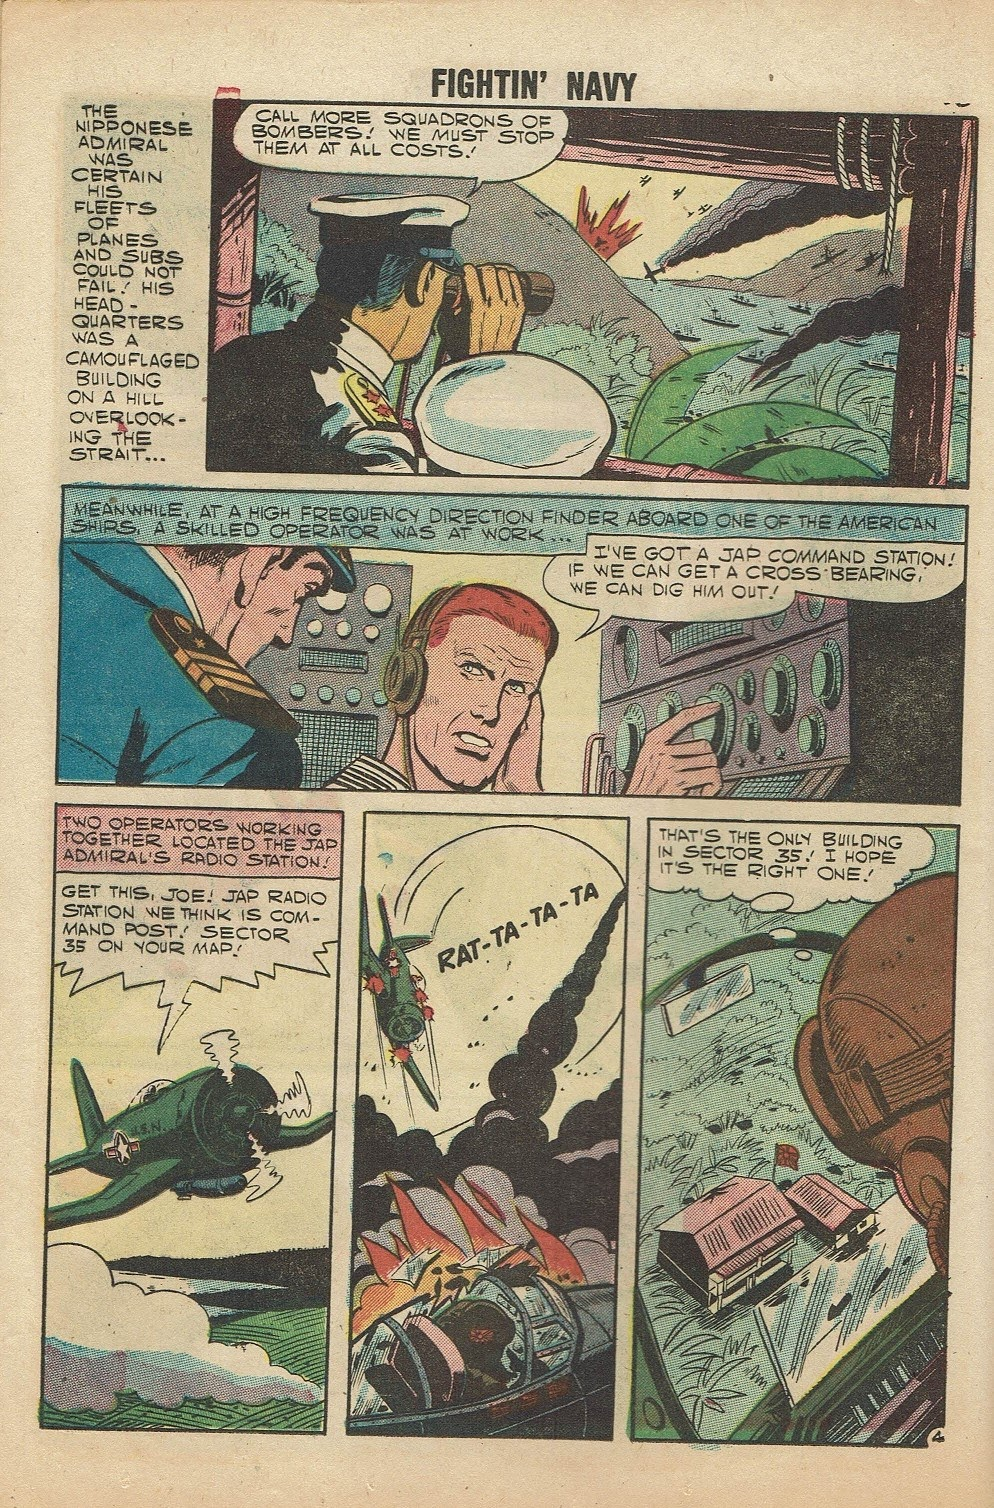 Read online Fightin' Navy comic -  Issue #81 - 12